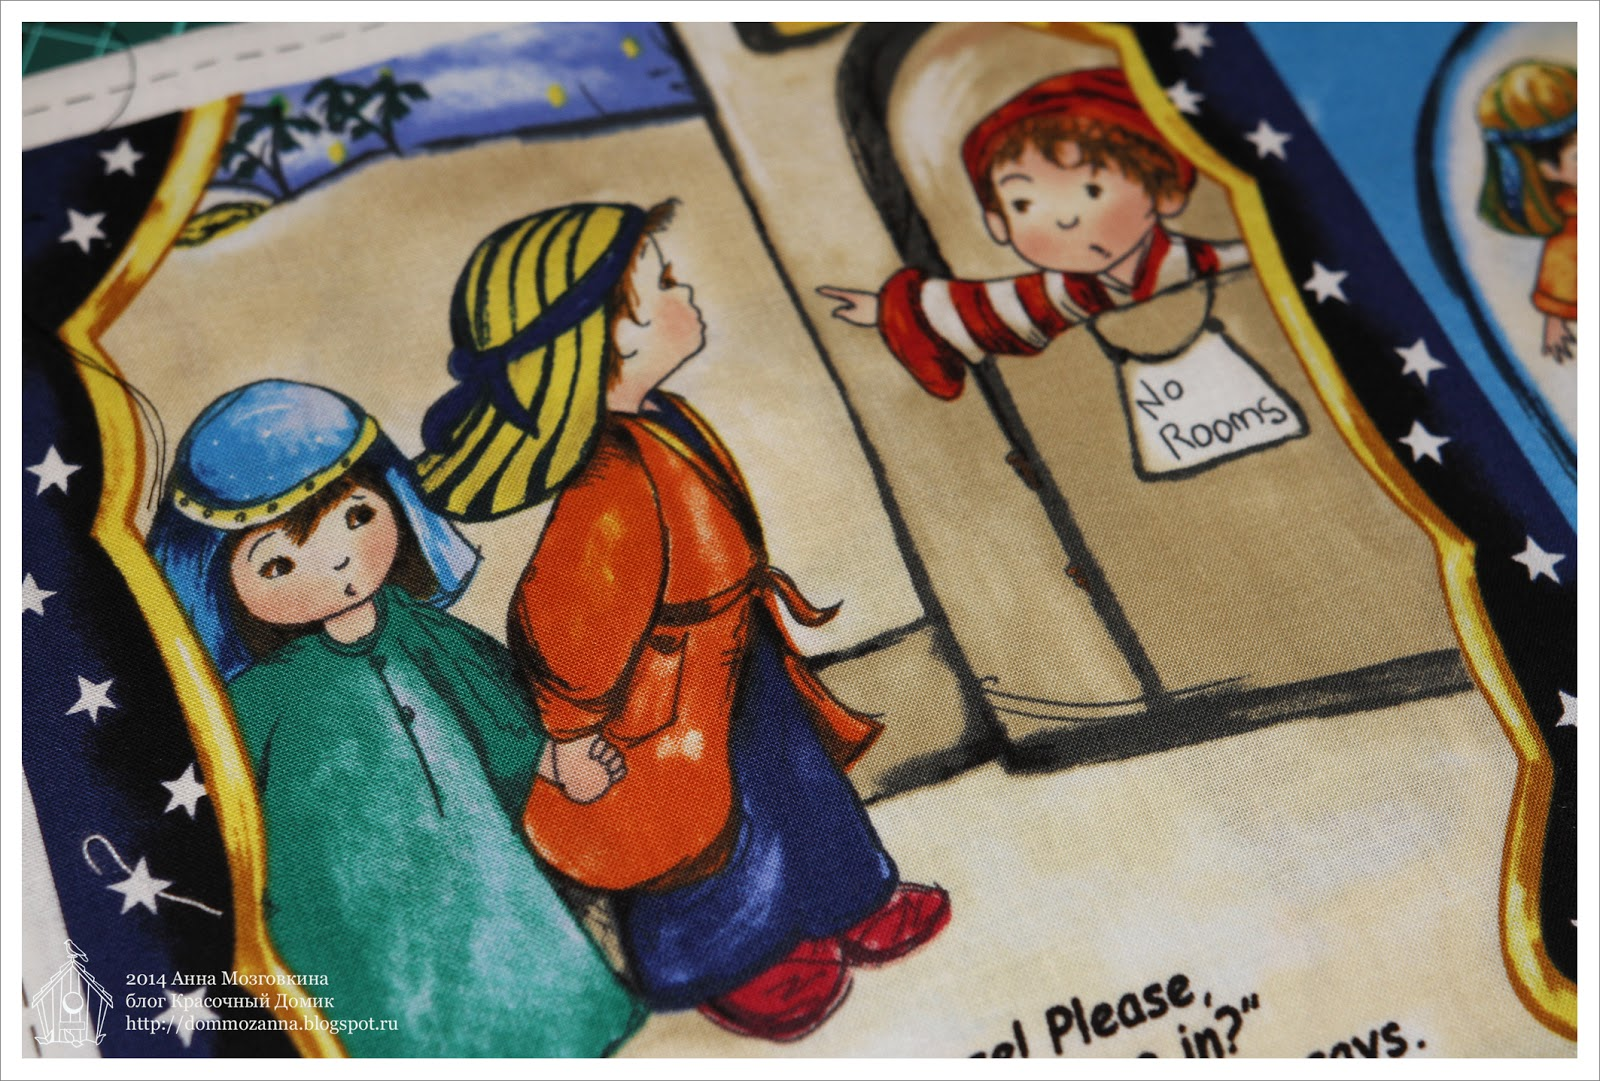 Рождество Христово книжка своими руками